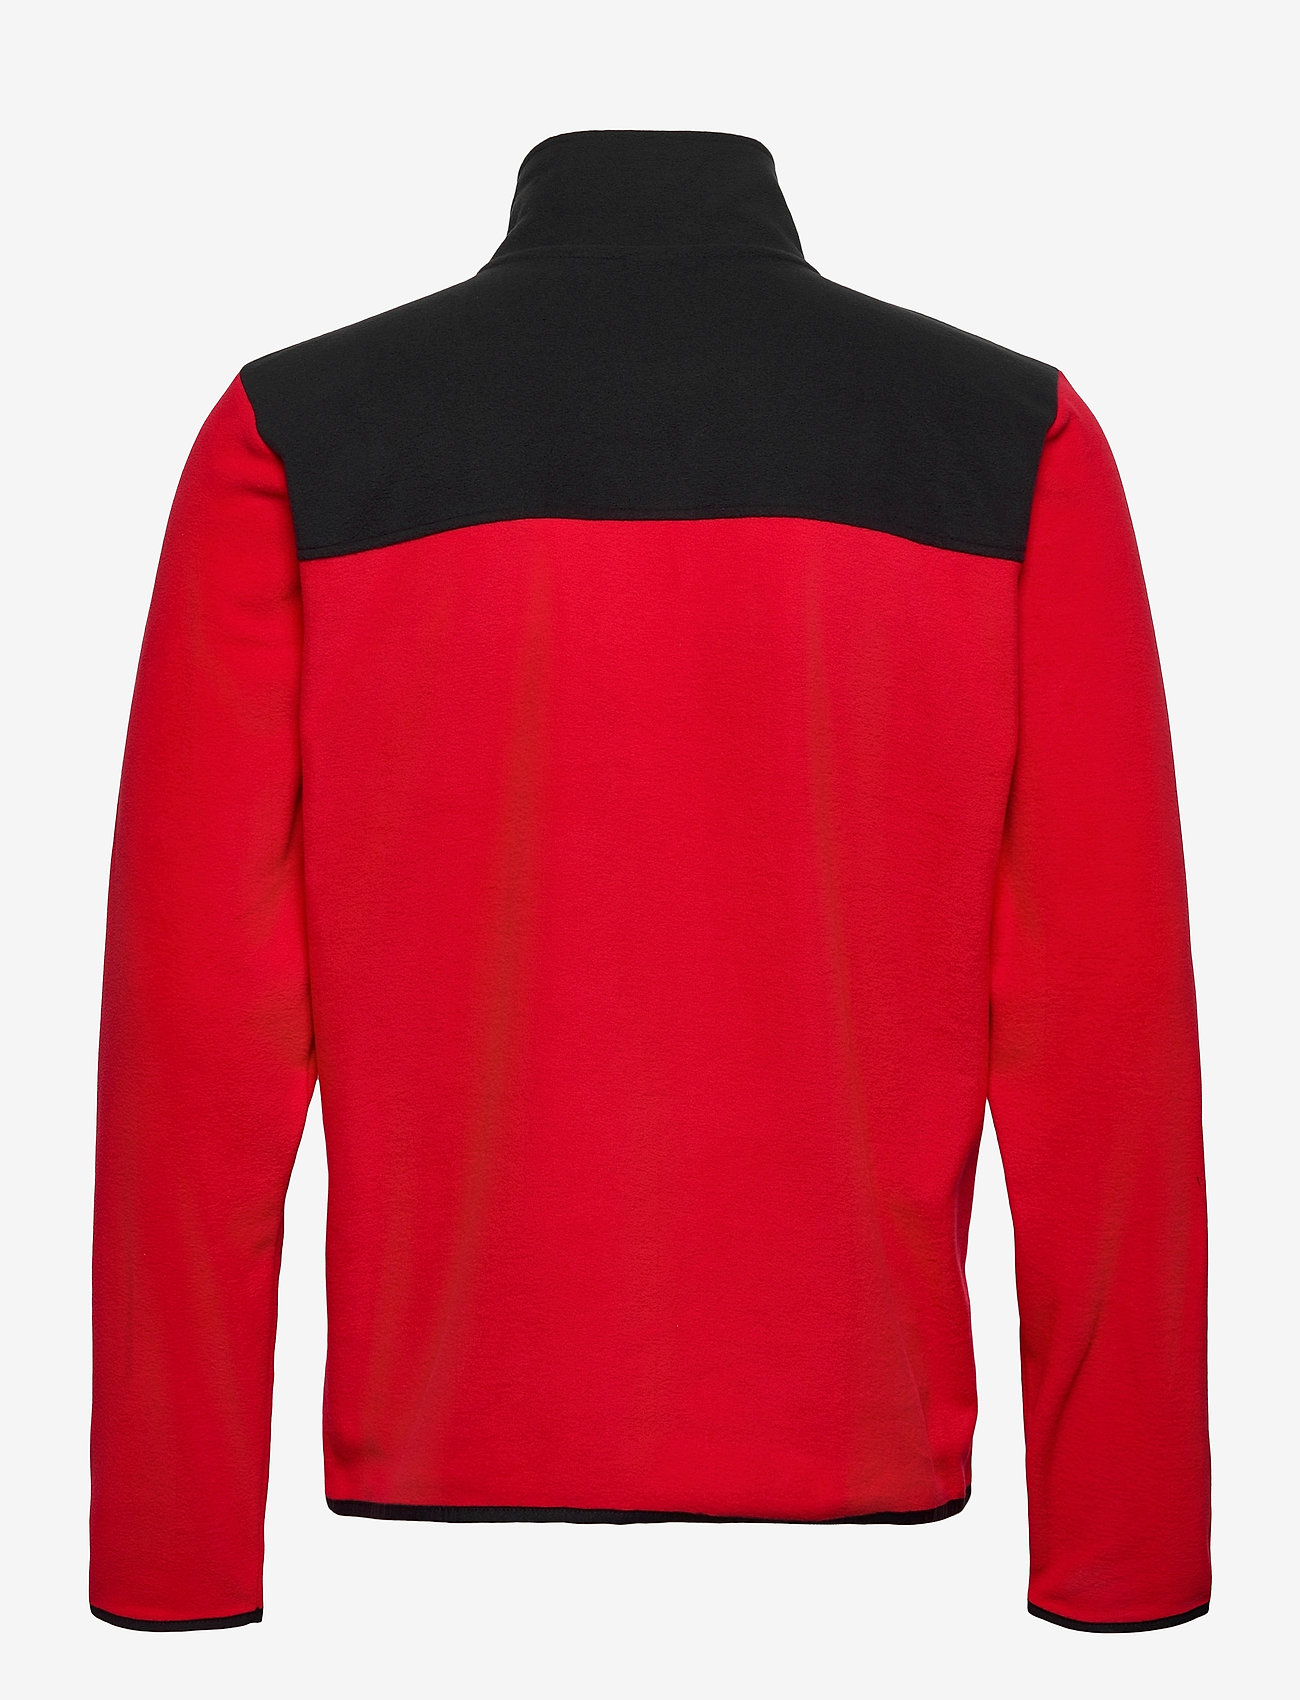 The North Face - M TKAGLCR FZJKT - fleece - tnf red-tnf black - 1